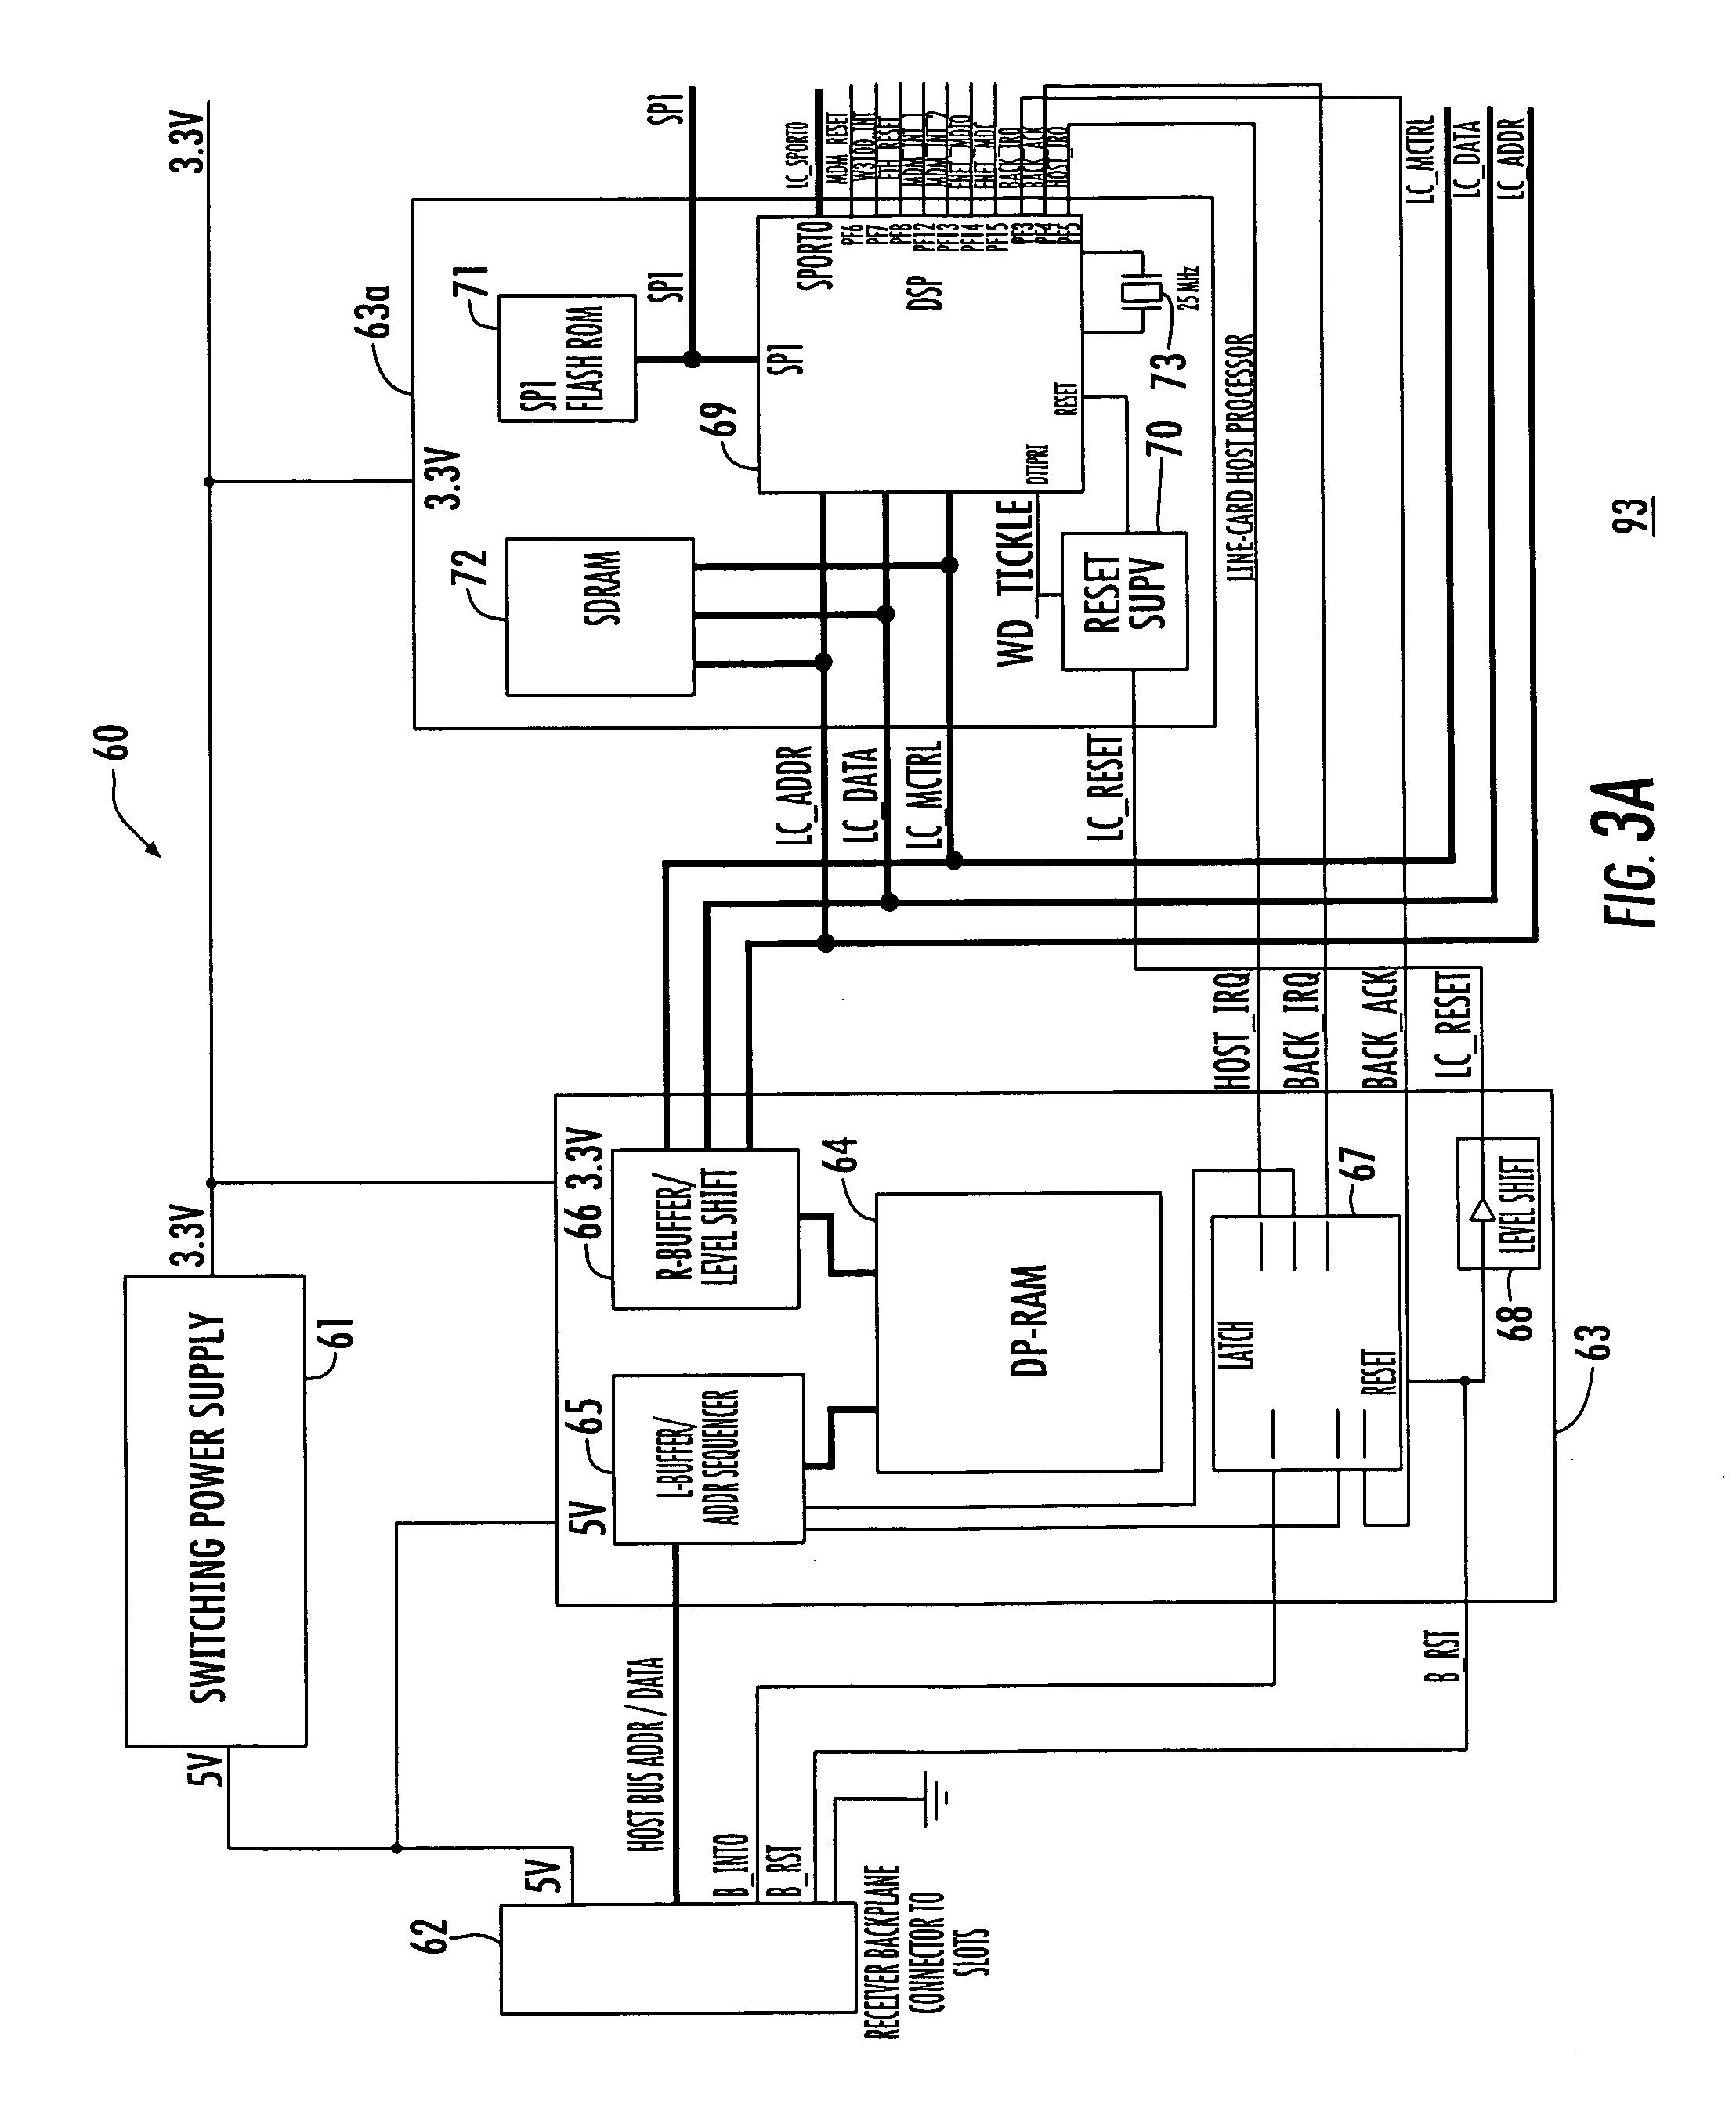 aico smoke alarm wiring diagram msd coil 3 wire detector library